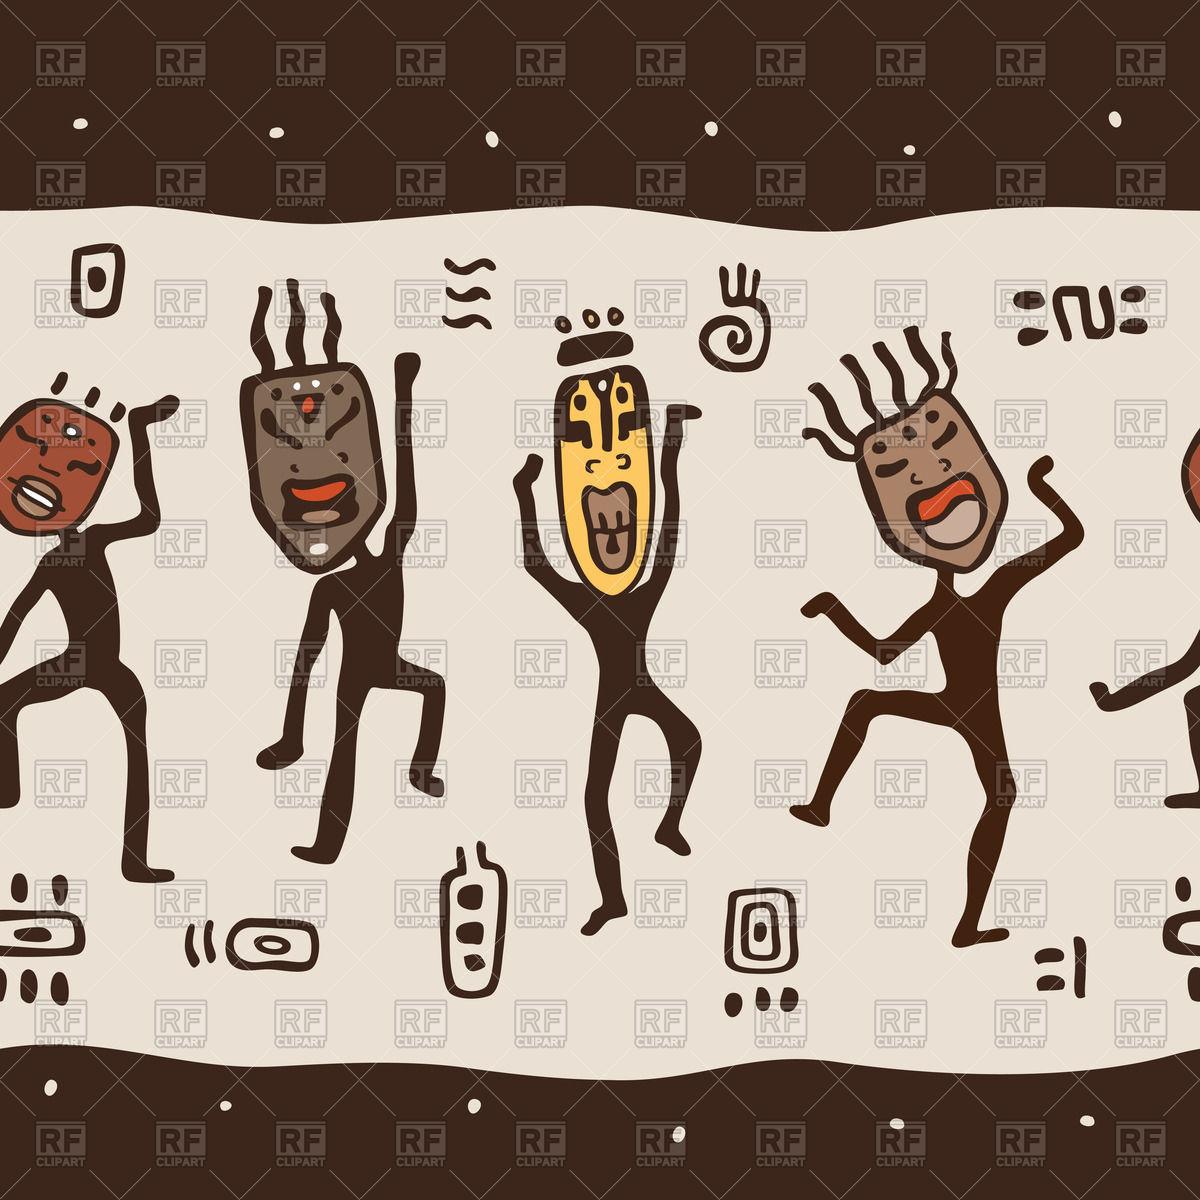 Ritual clipart #17, Download drawings